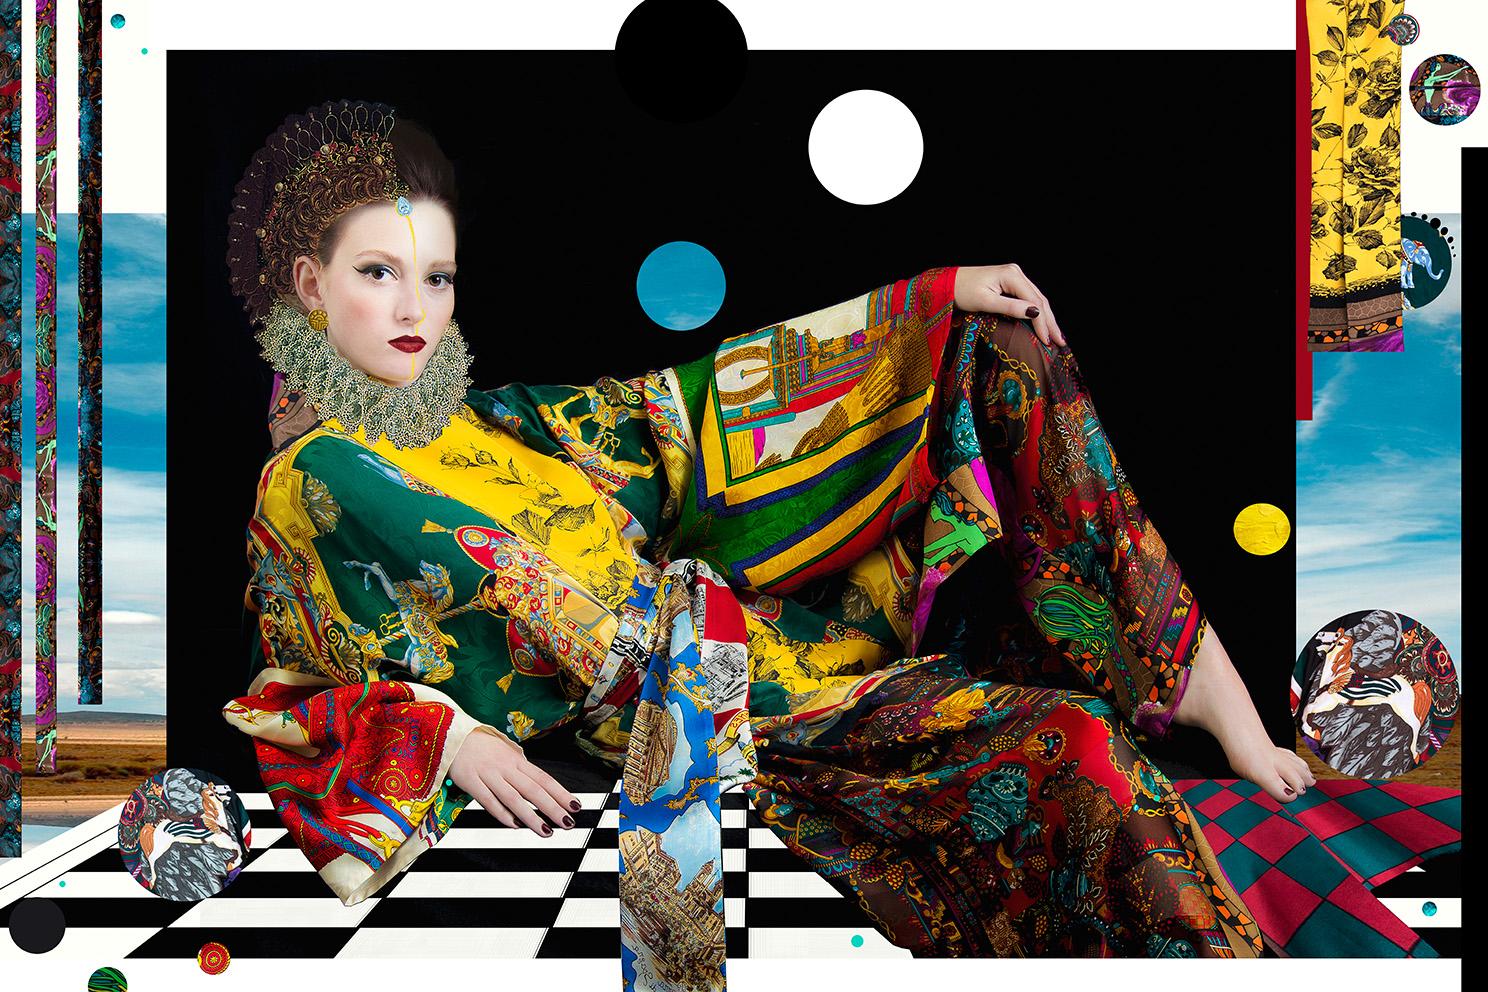 12©Anka Bardeleben-Kollage RIANNA+NINA Summer2016#04-pieces.jpg